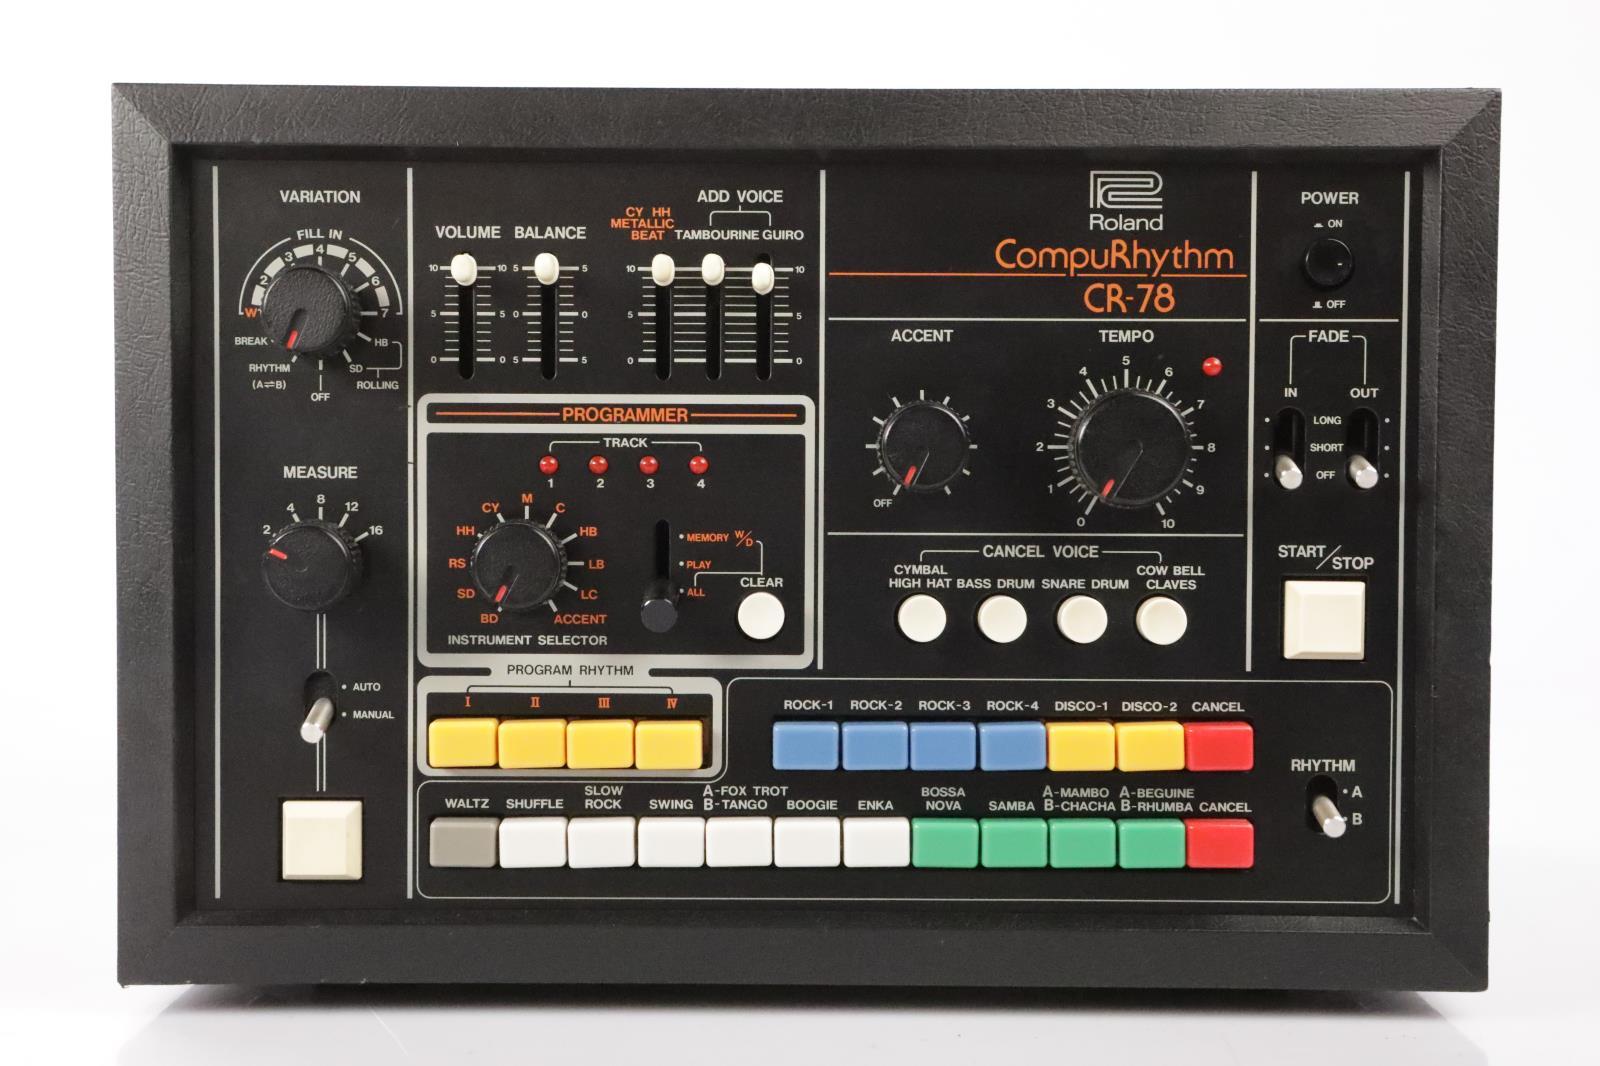 Roland CR-78 Compurhythm Drum Machine Compu Rhythm CR78 Beat Sequencer #34732